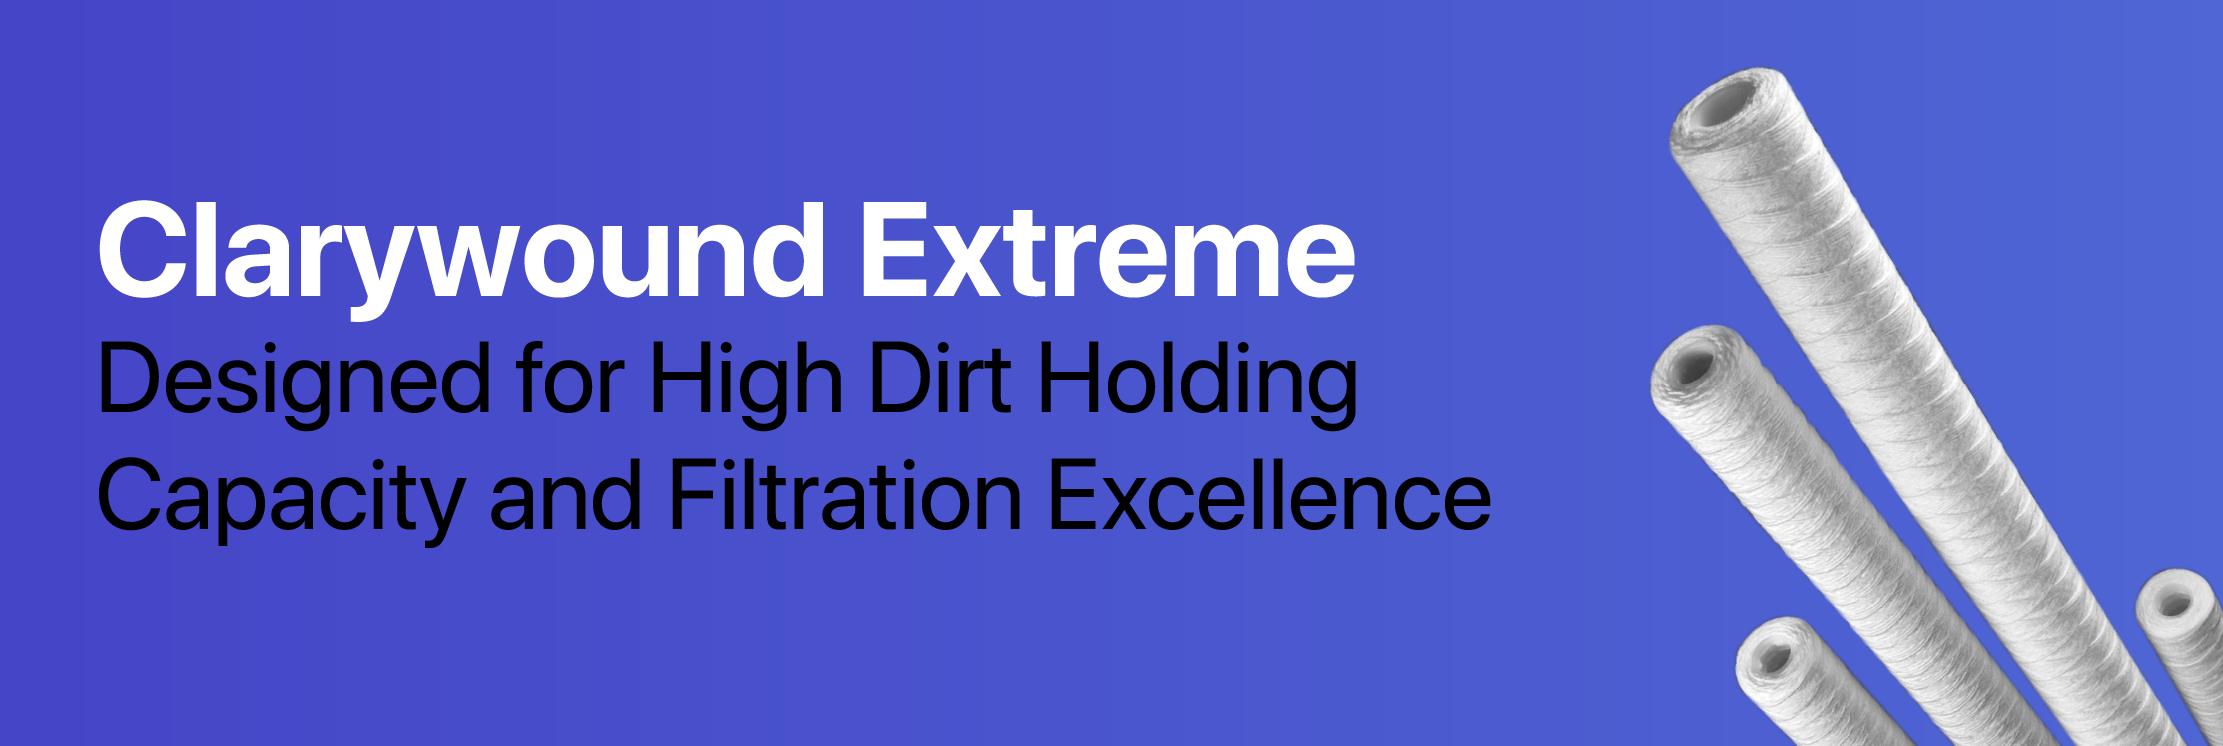 Clarywound Extreme